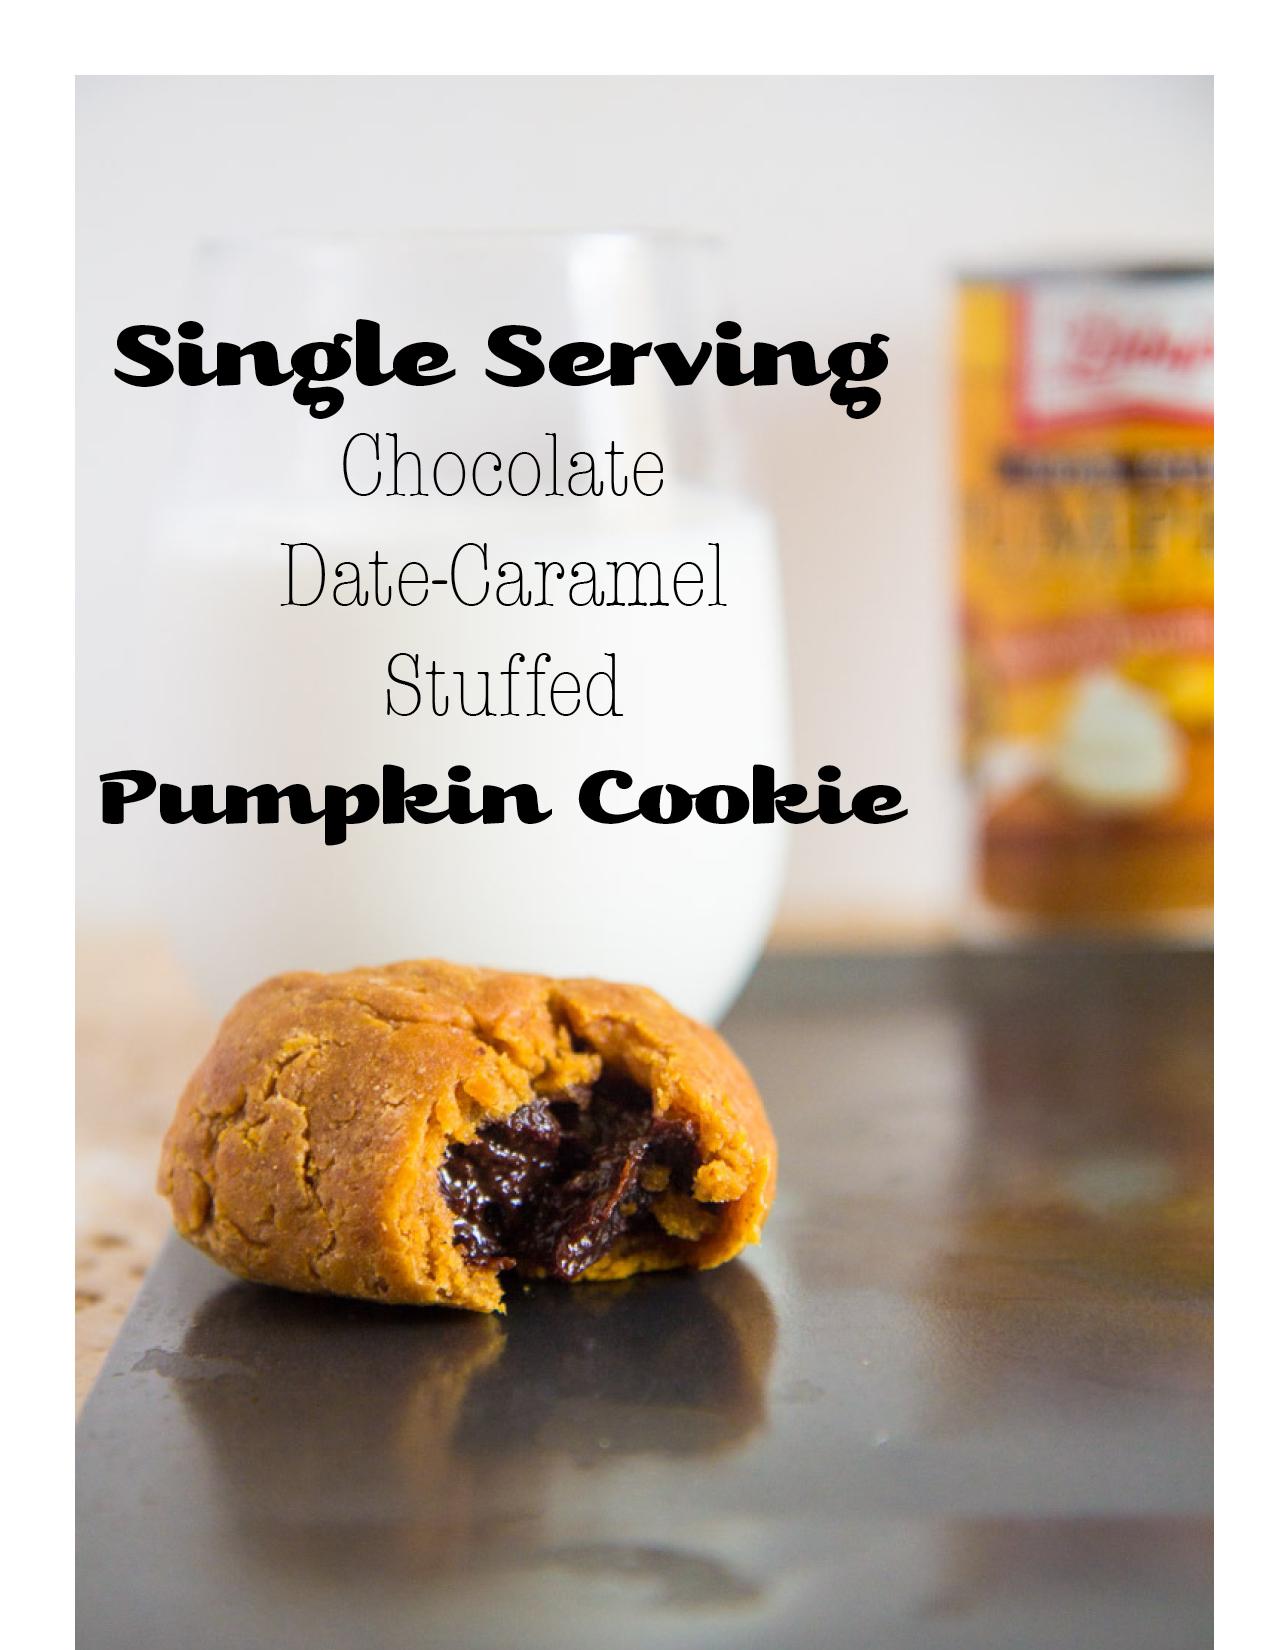 Chocolate Date Caramel Pumpkin Cookie